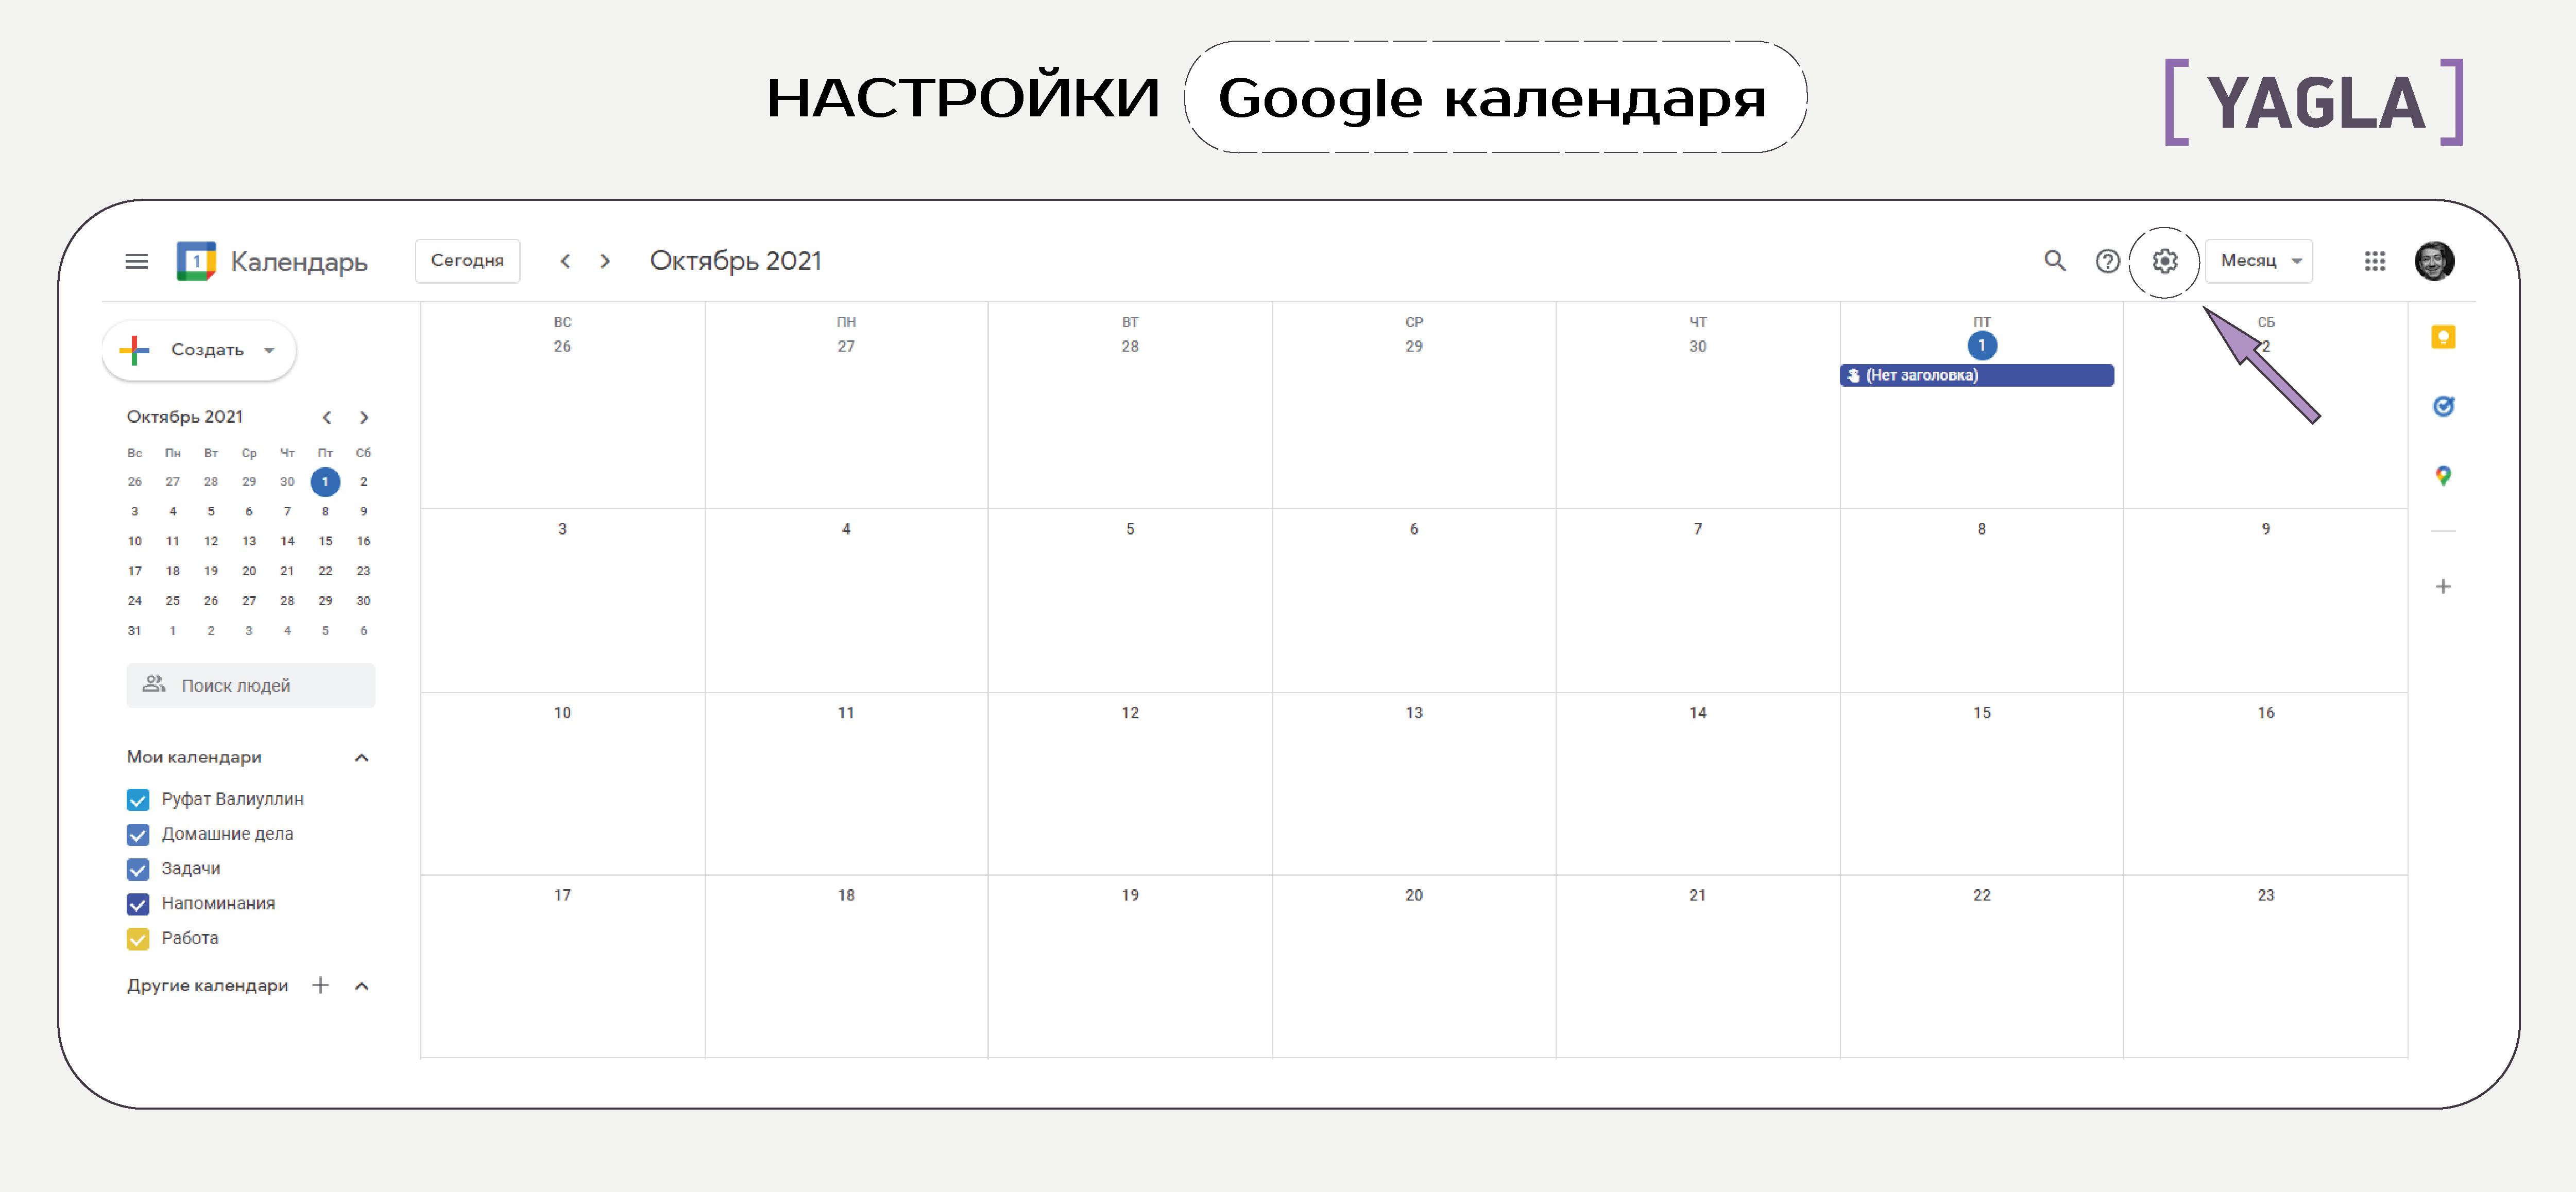 Настройки Google календаря